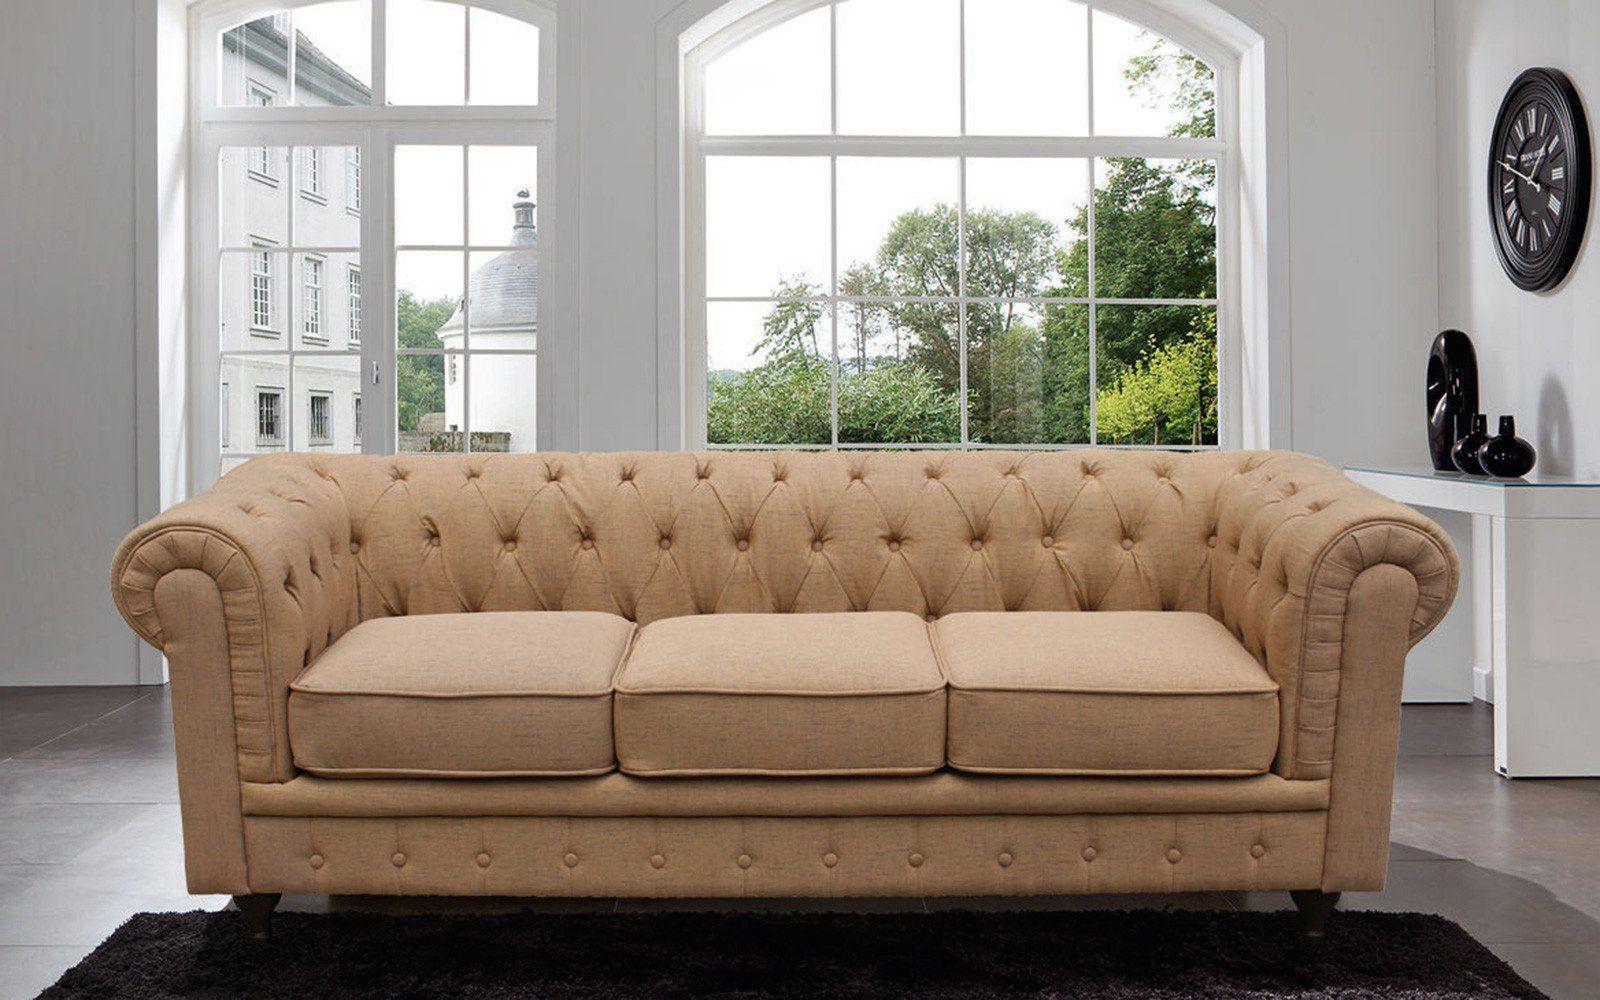 Charleston Classic Chesterfield Linen Sofa White Leather Sofas Leather Chesterfield Sofa Tufted Leather Sofa